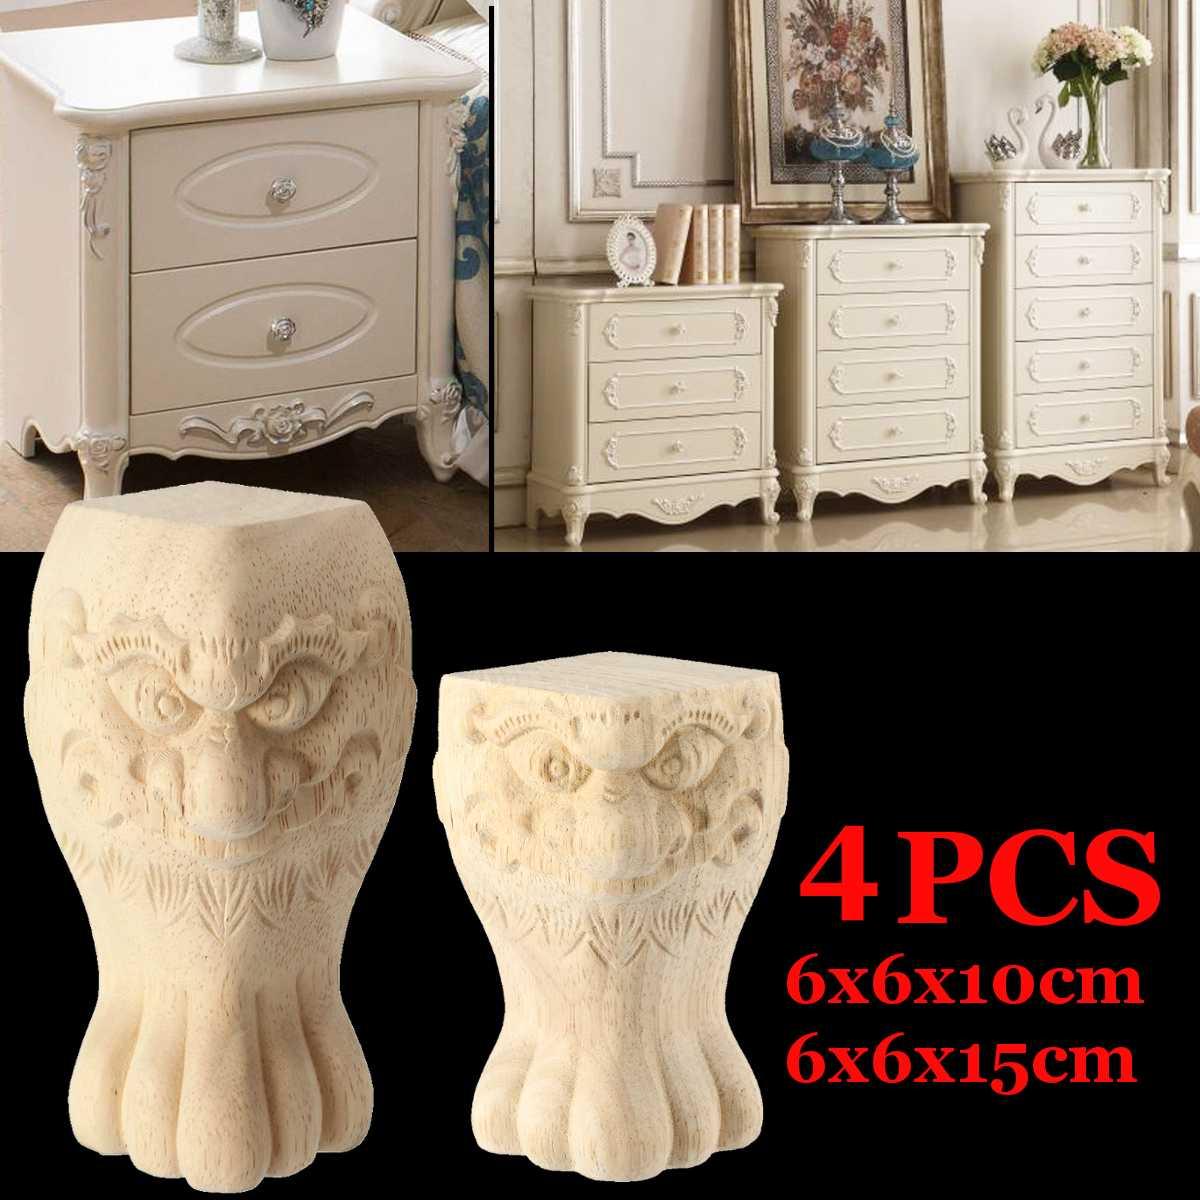 4Pcs 10/15cm European Carved Furniture Legs Foot Wood TV Cabinet Seat Foot Bathroom Cabinet Legs